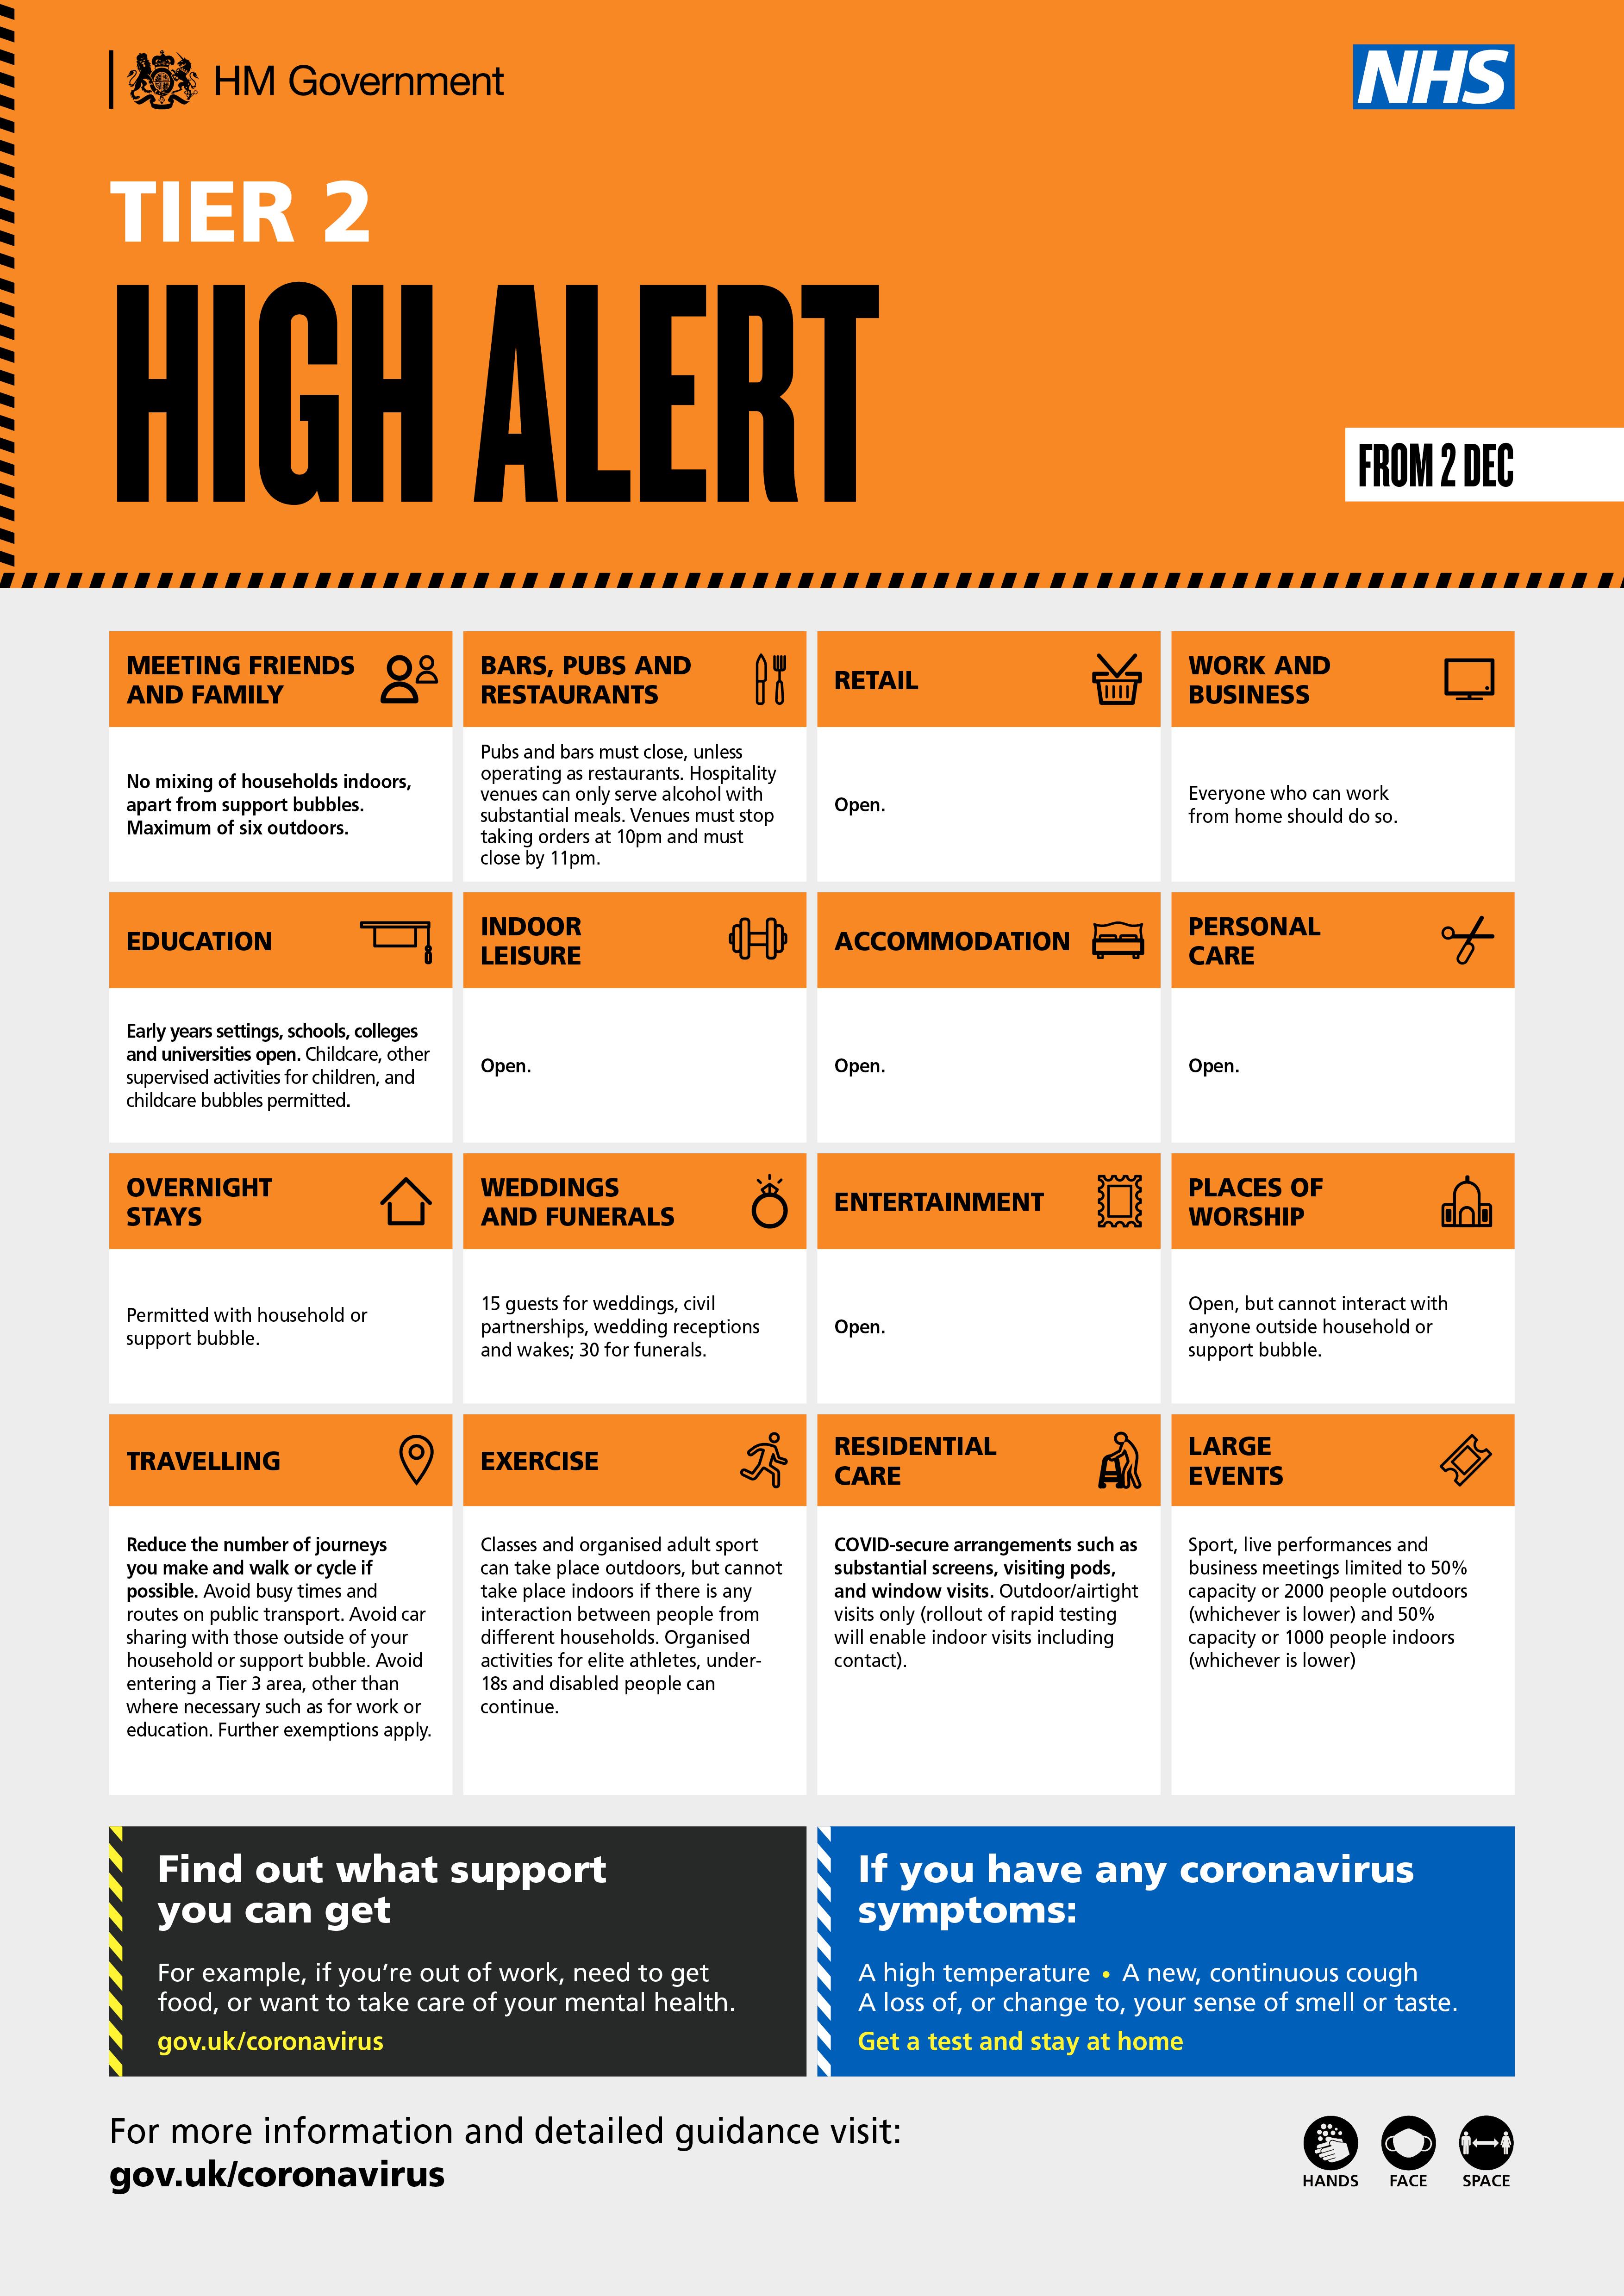 Tier 2 - High Alert